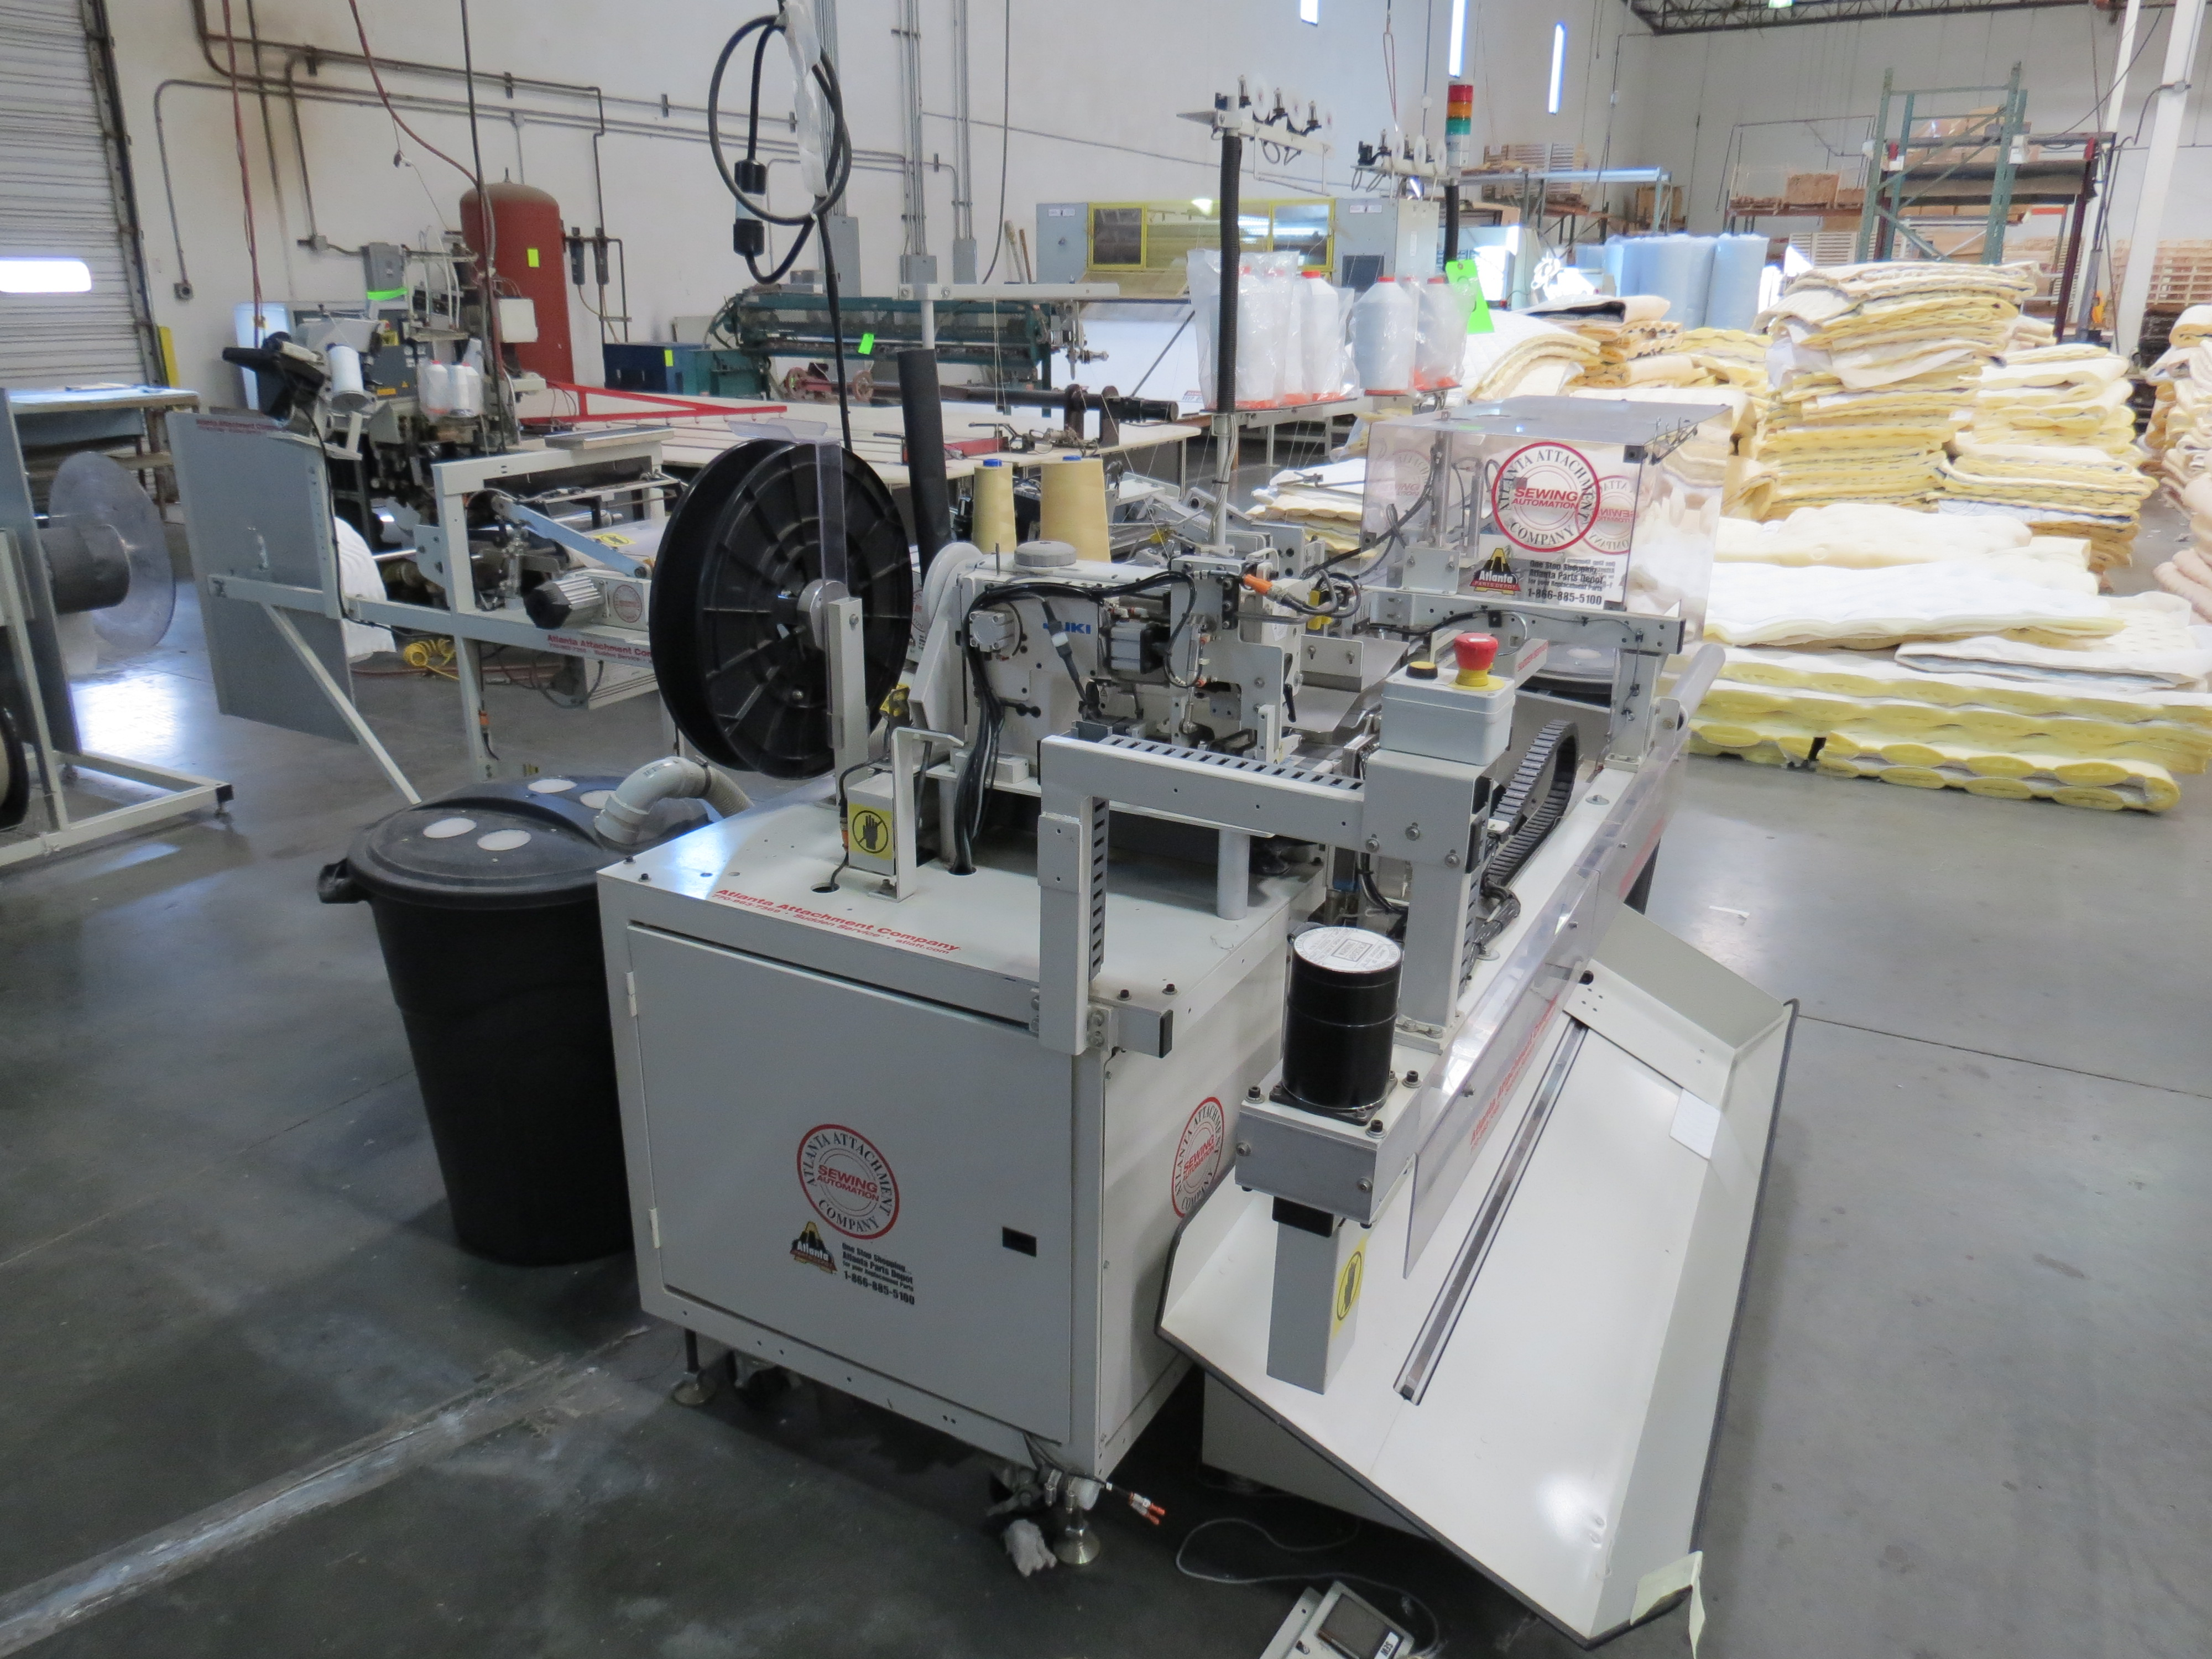 Atlanta Attachment Company, 4300BBorder/Attach Handles Sewing Machine, 220V, SN:209227071609, Juki - Image 3 of 11